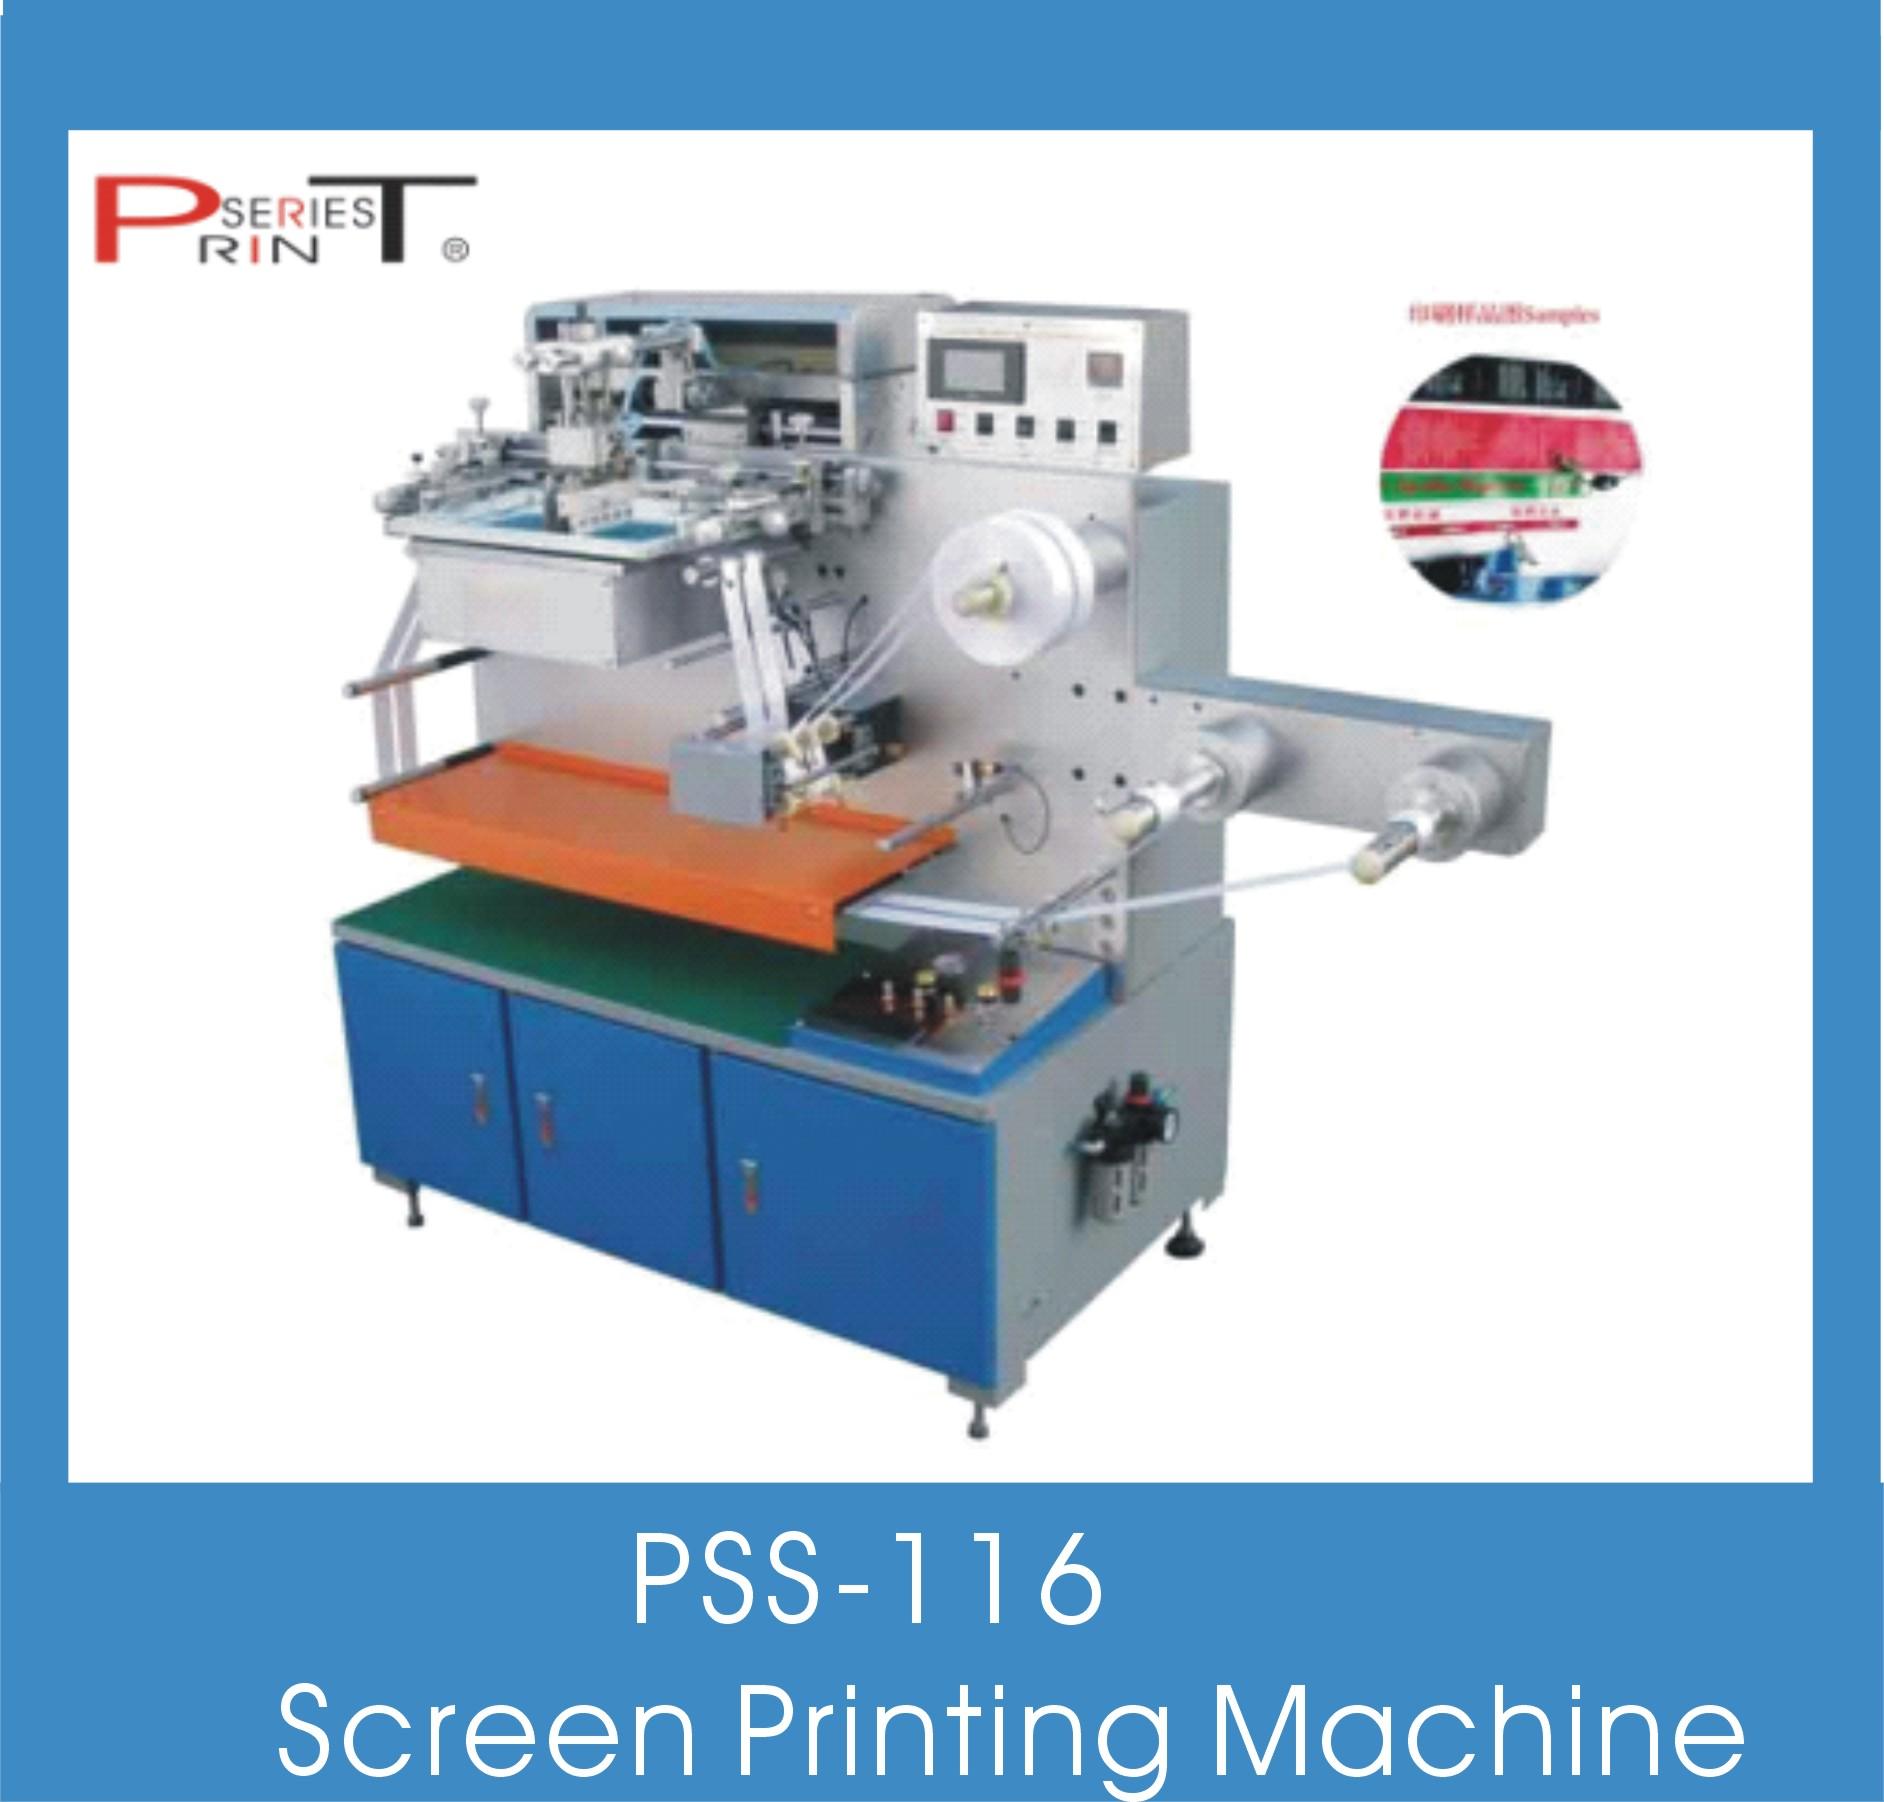 Inhouse Screen Printing Machine for Satin & Taffeta Ribbon, Inhouse Screen  Printing Machine for Satin